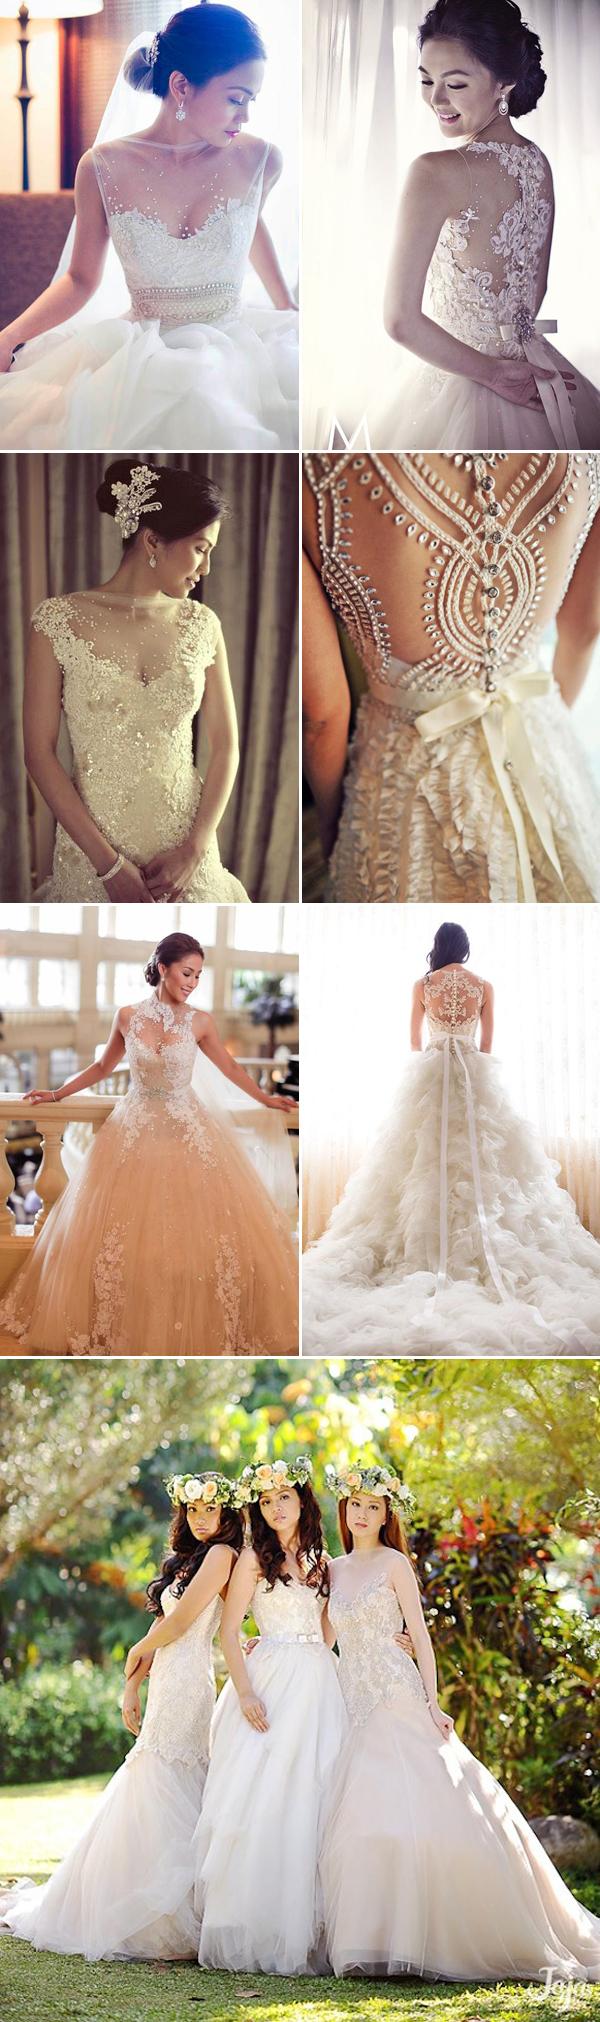 Top 10 Filipino Wedding Dress Designers We Love! - Praise Wedding